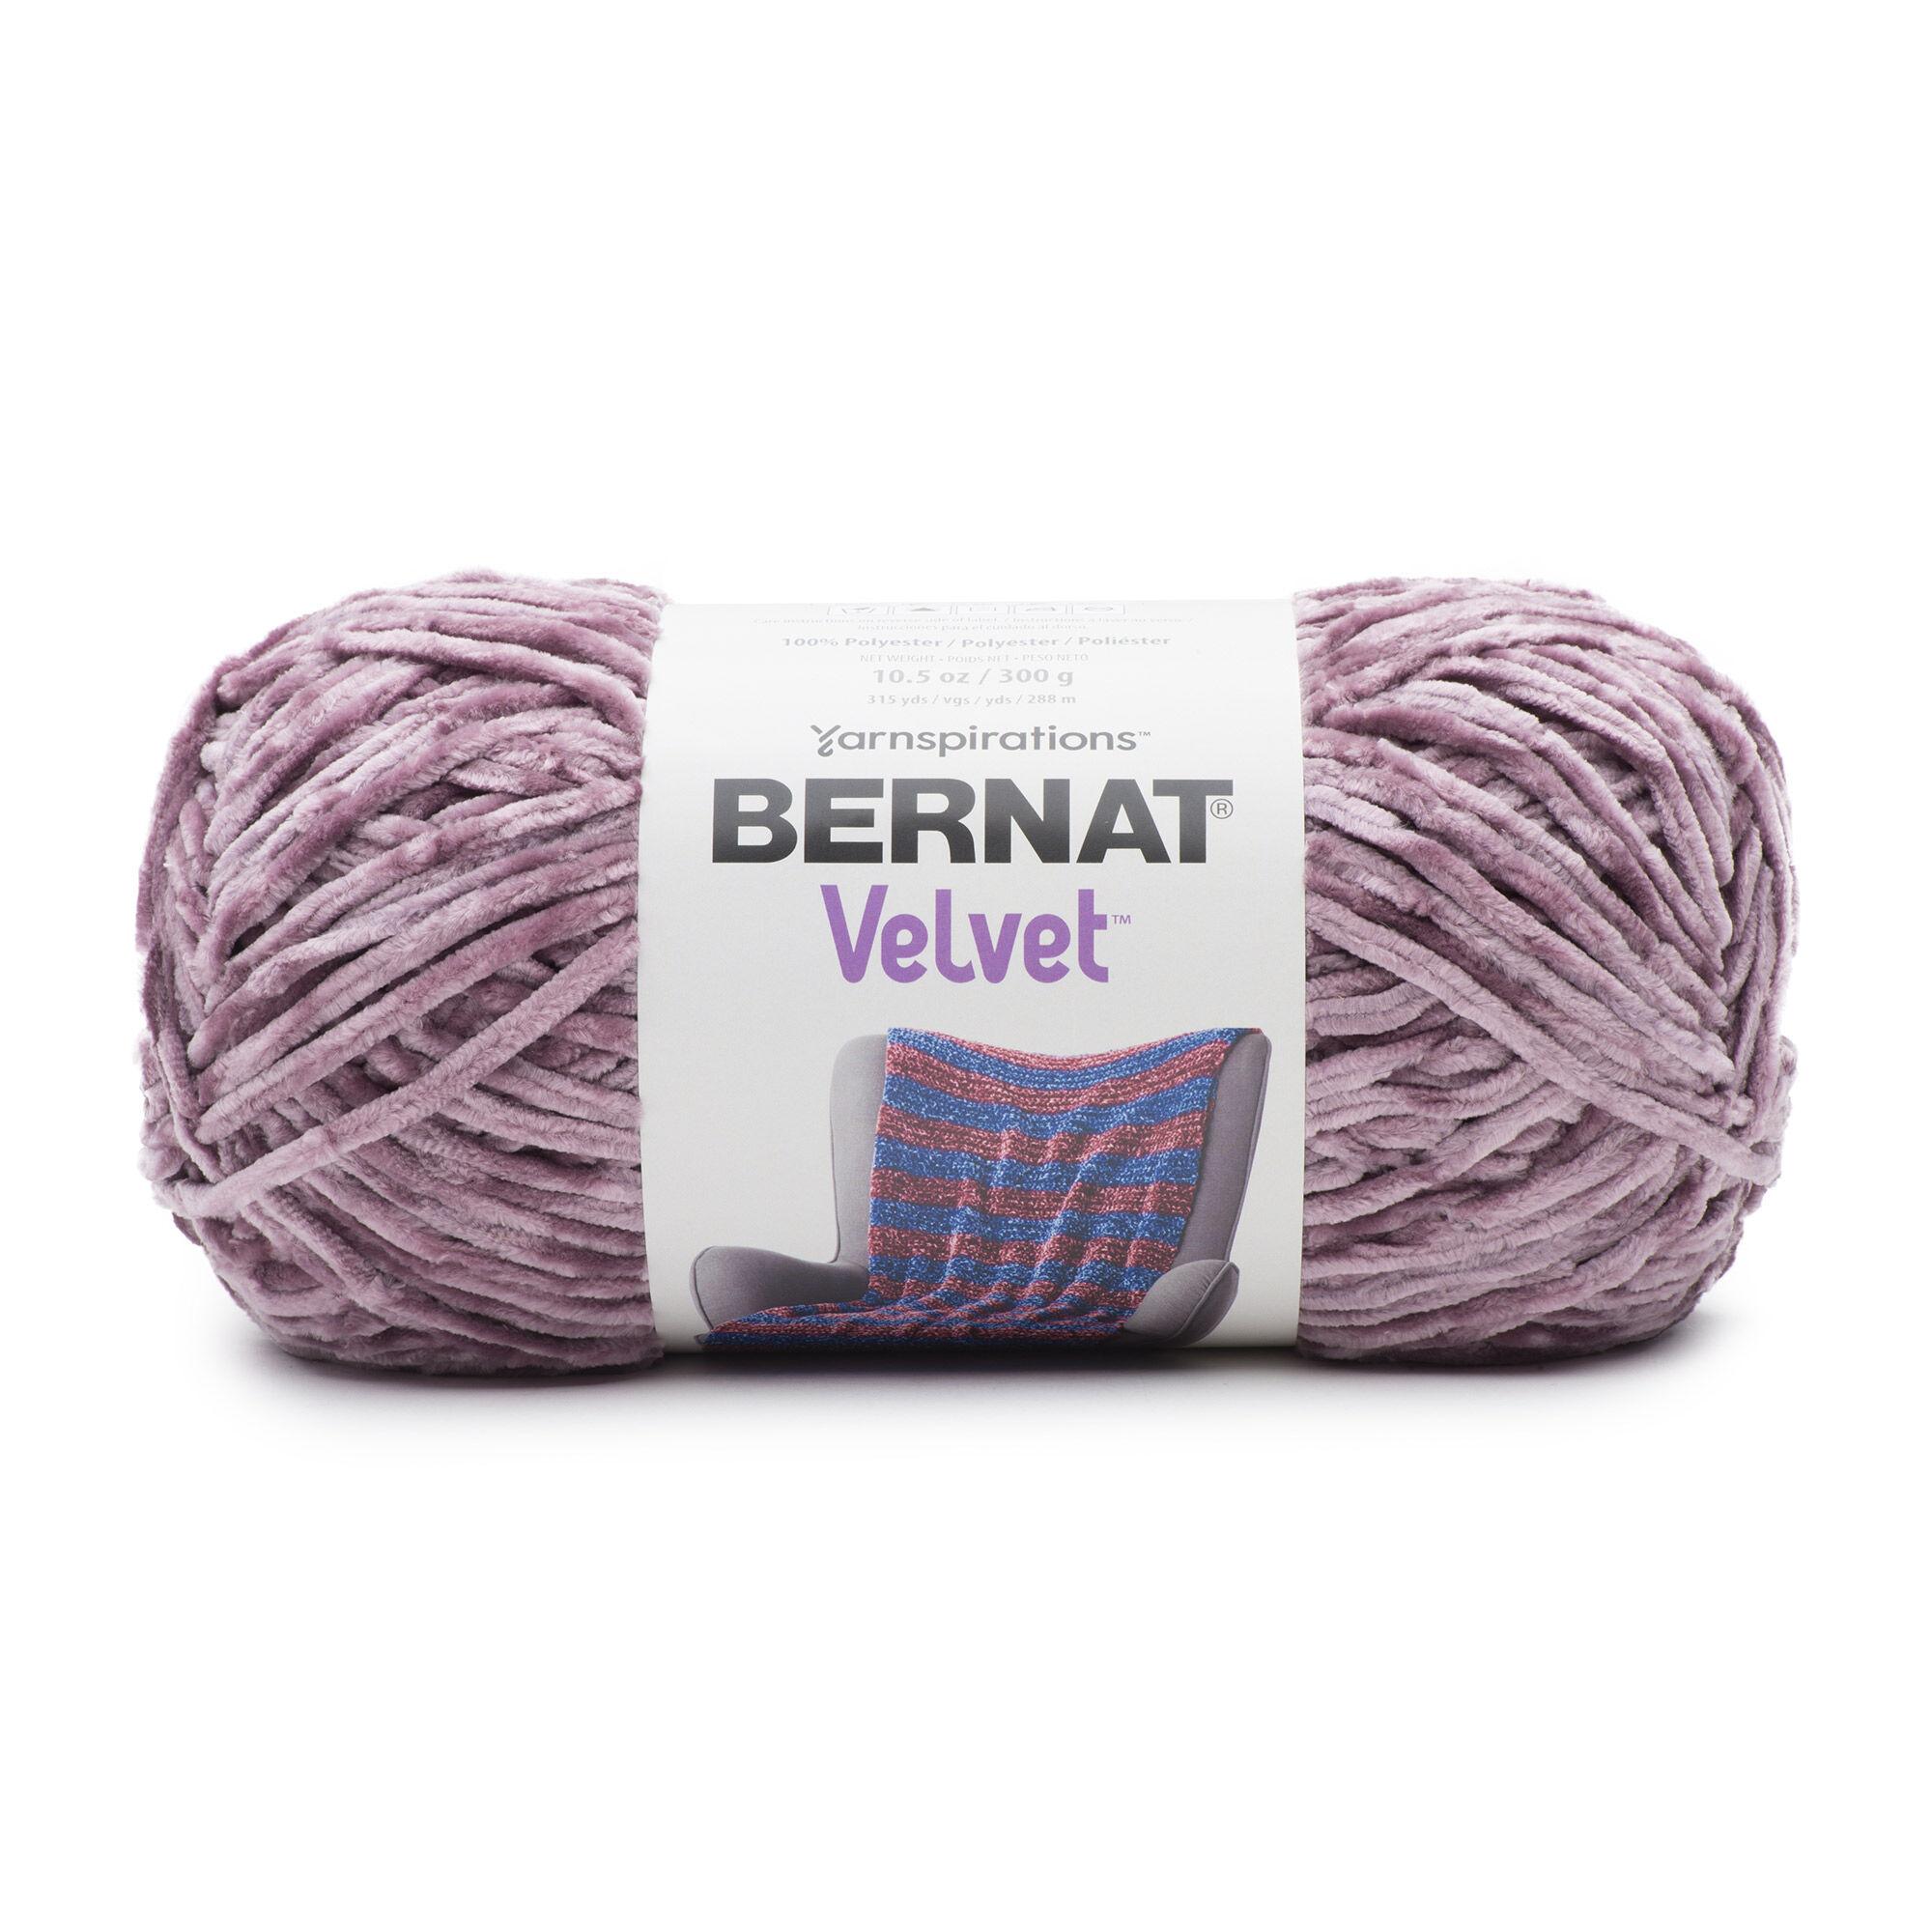 Hand Knit Velvet Sweater More Colors